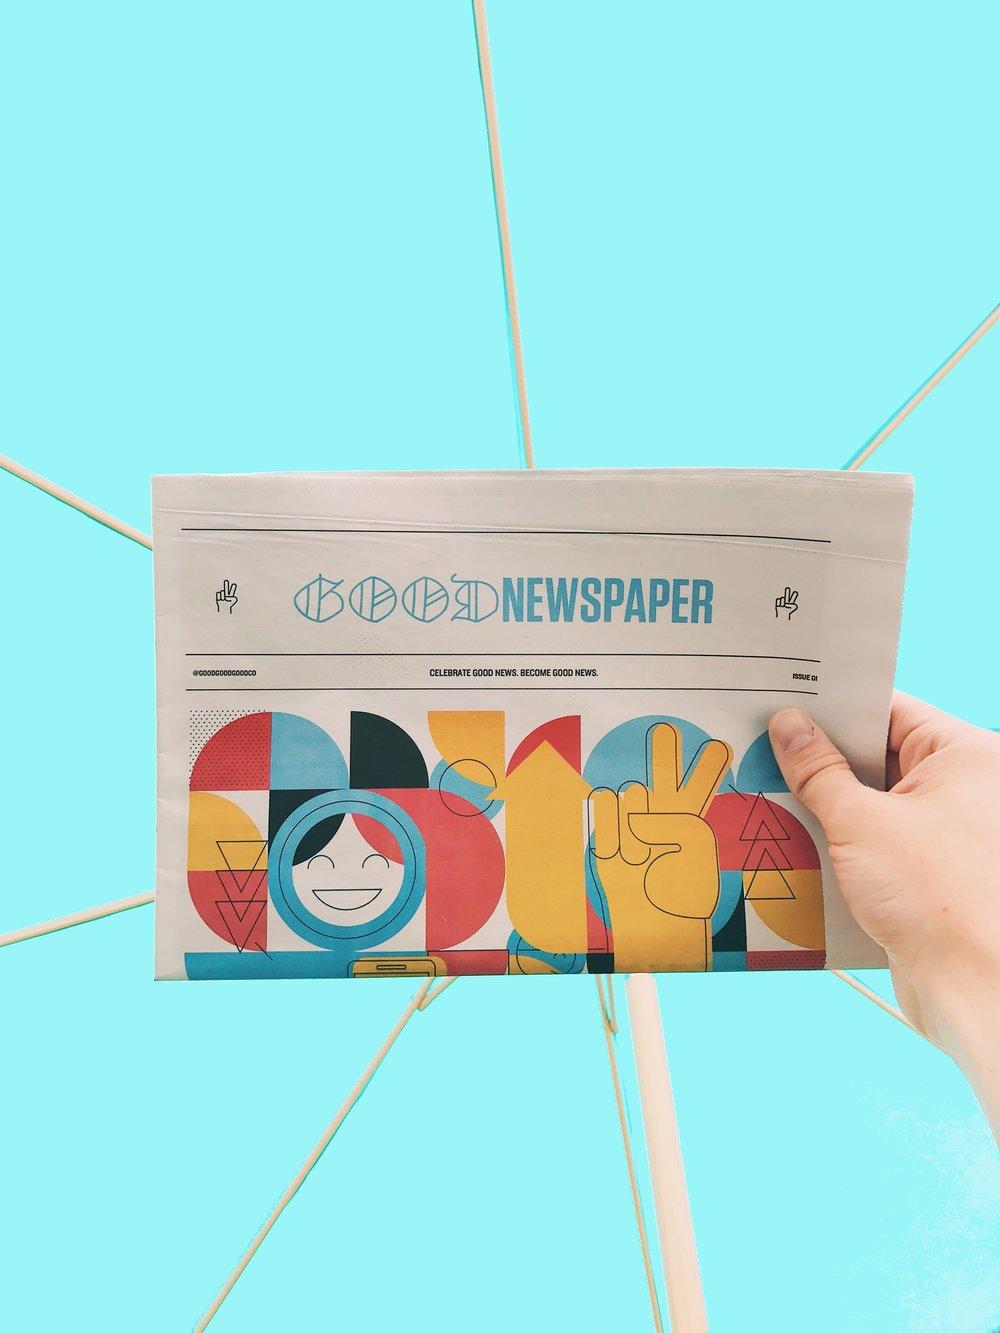 goodnewspaper.jpg